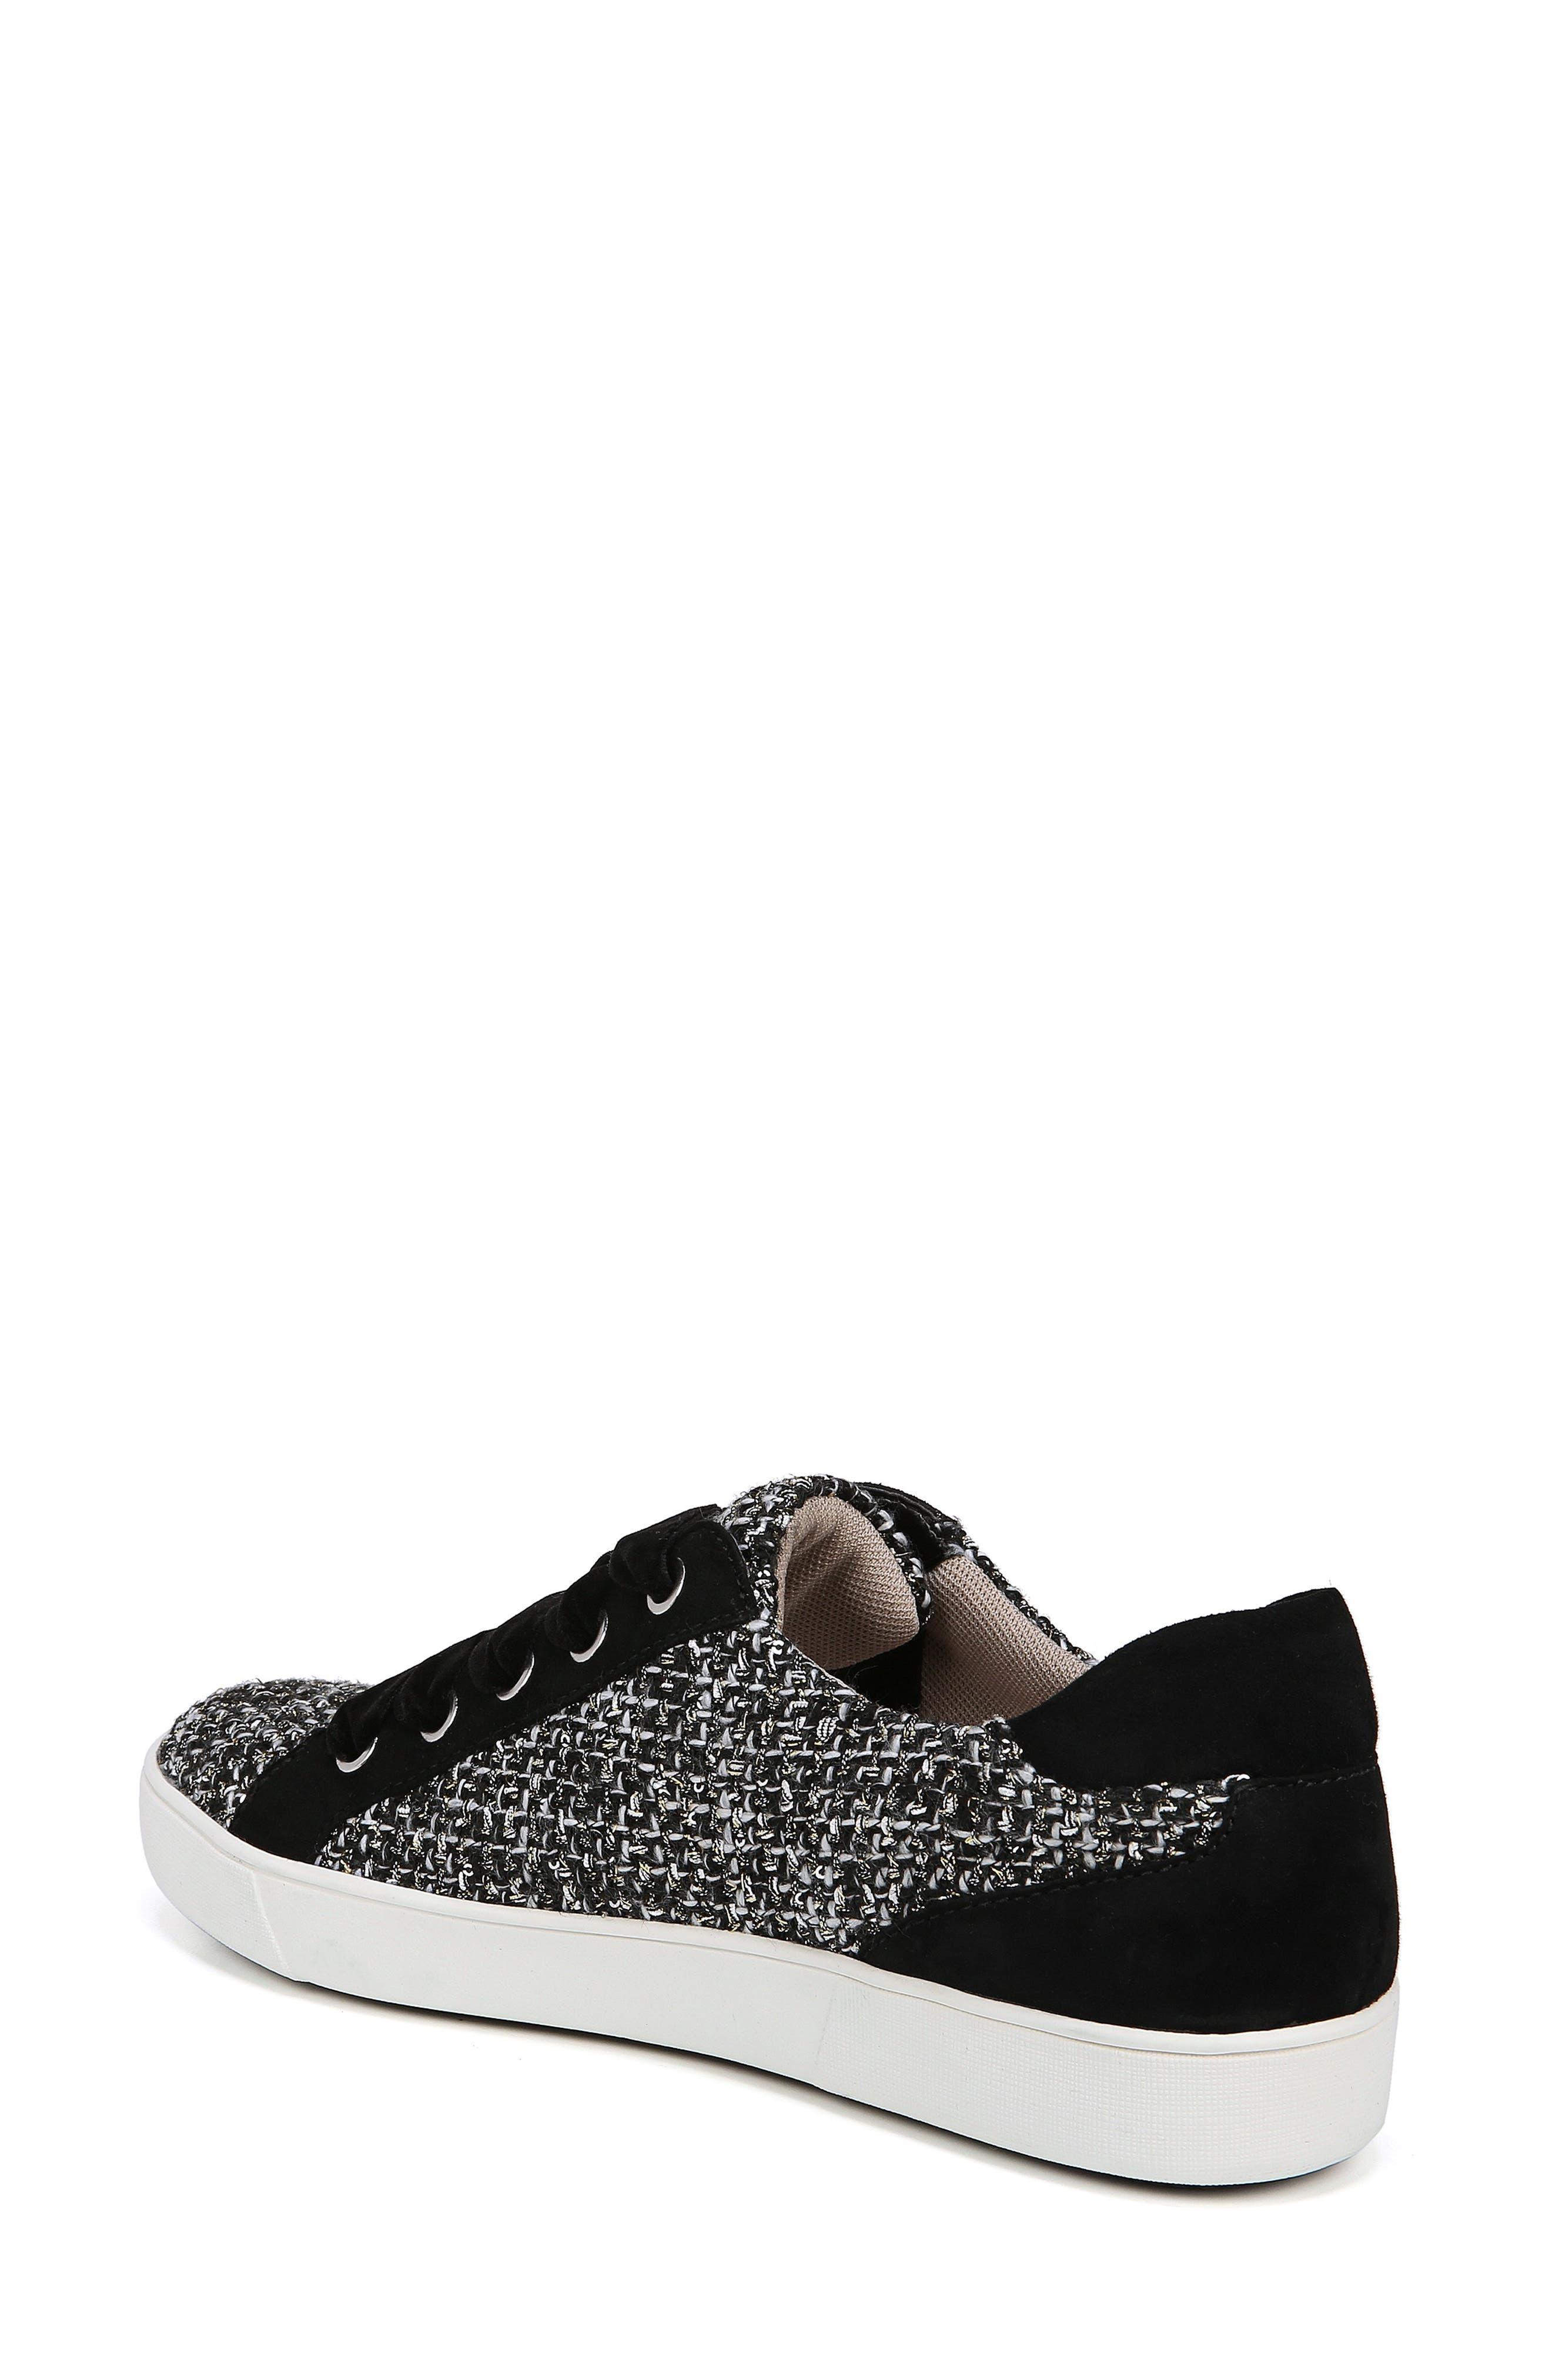 Morrison Sneaker,                             Alternate thumbnail 2, color,                             BLACK/ WHITE TWEED FABRIC